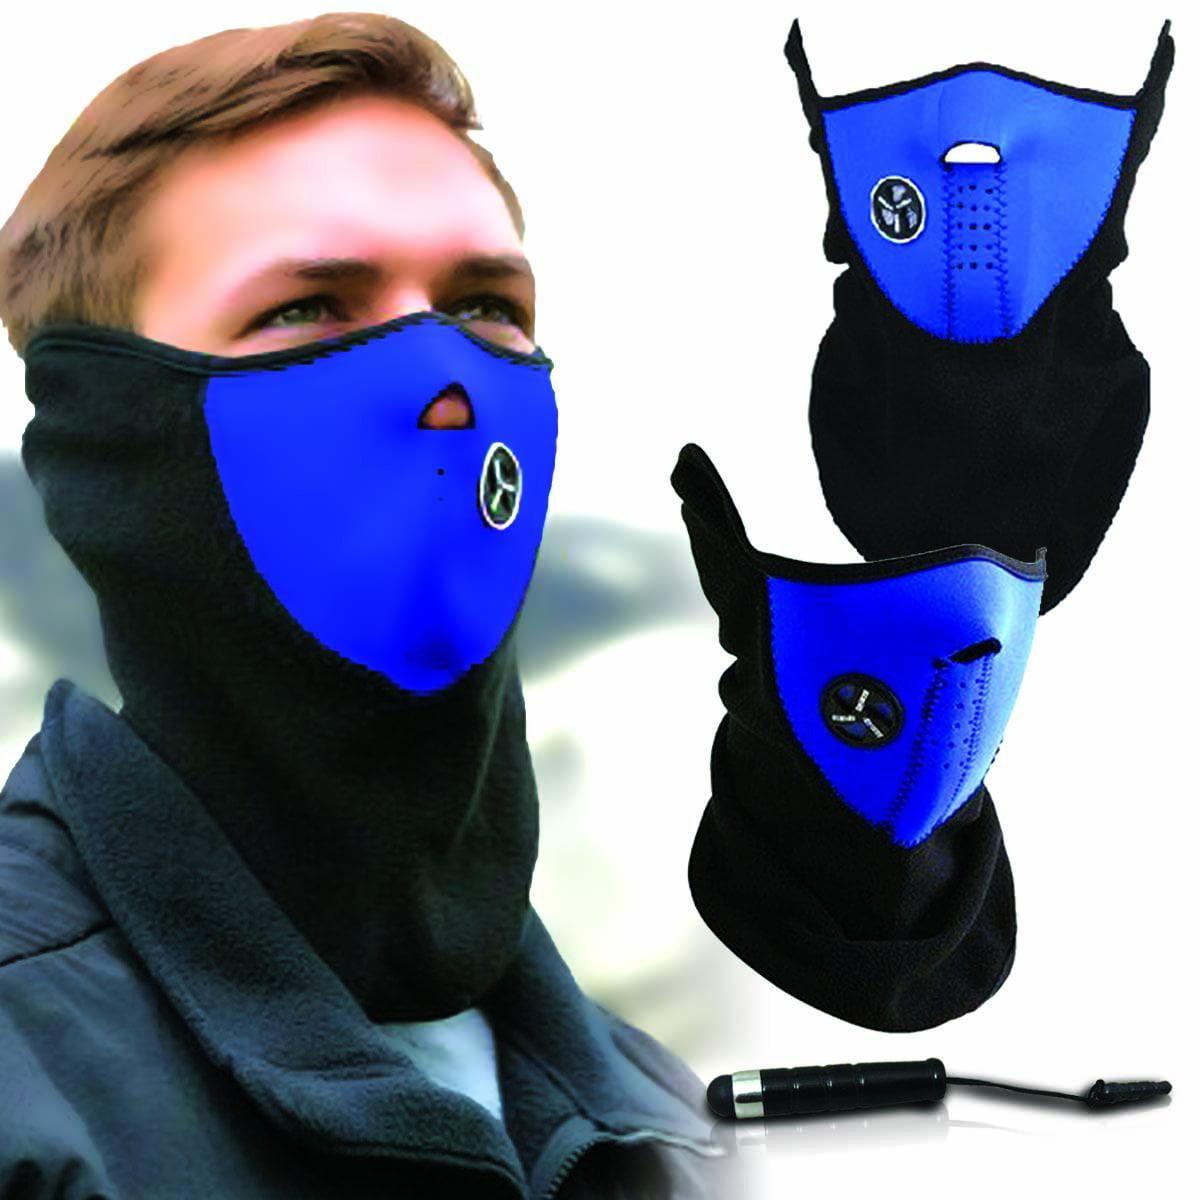 AmaziPro8 Unisex Neoprene Face Mask + BONUS Stylus Pen + Phone Antidust  Plug 07d989928475